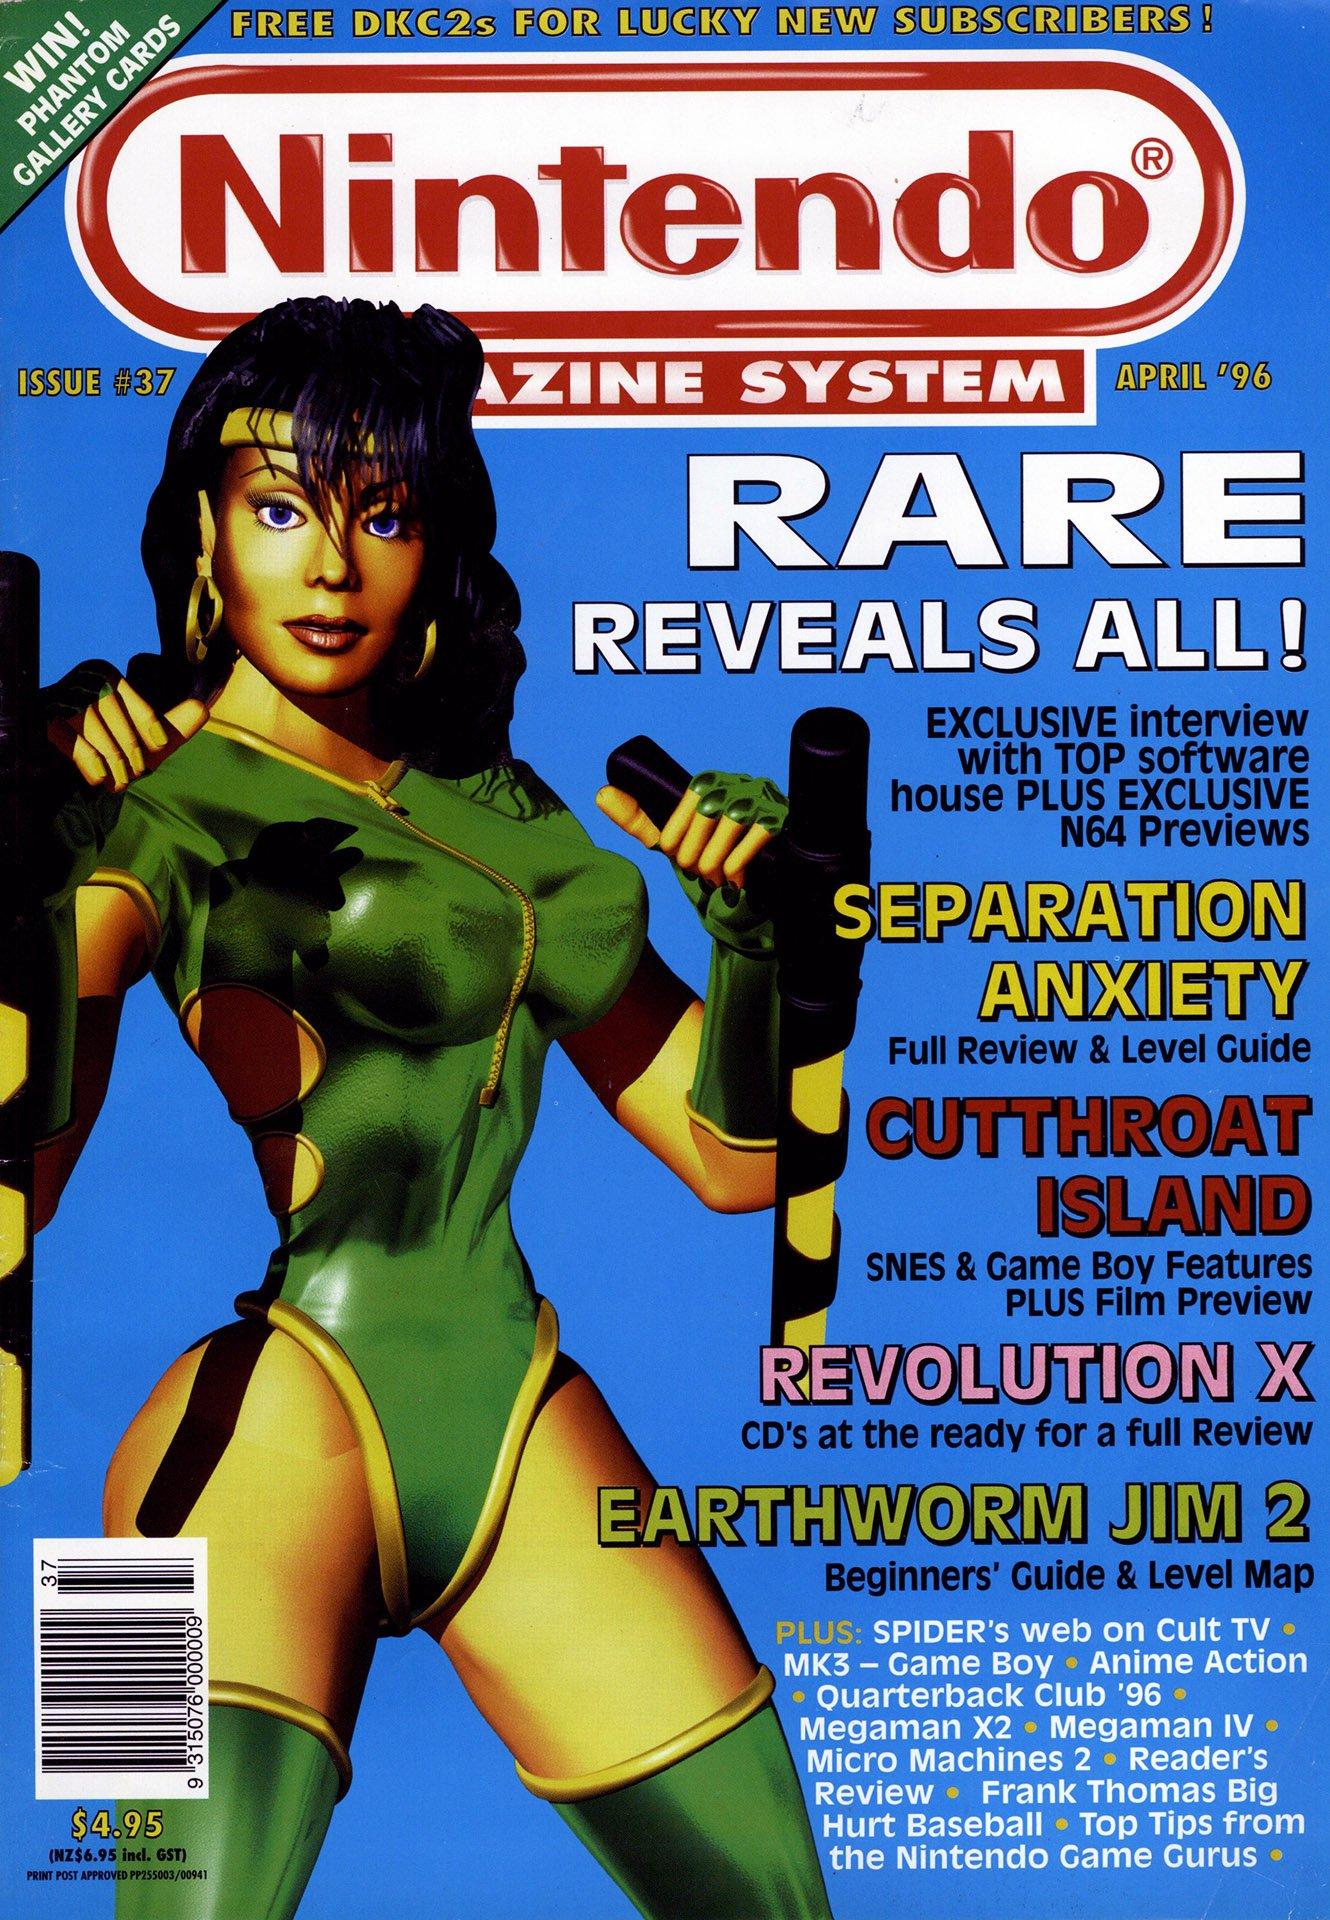 Nintendo Magazine System (AUS) 037 (April 1996)